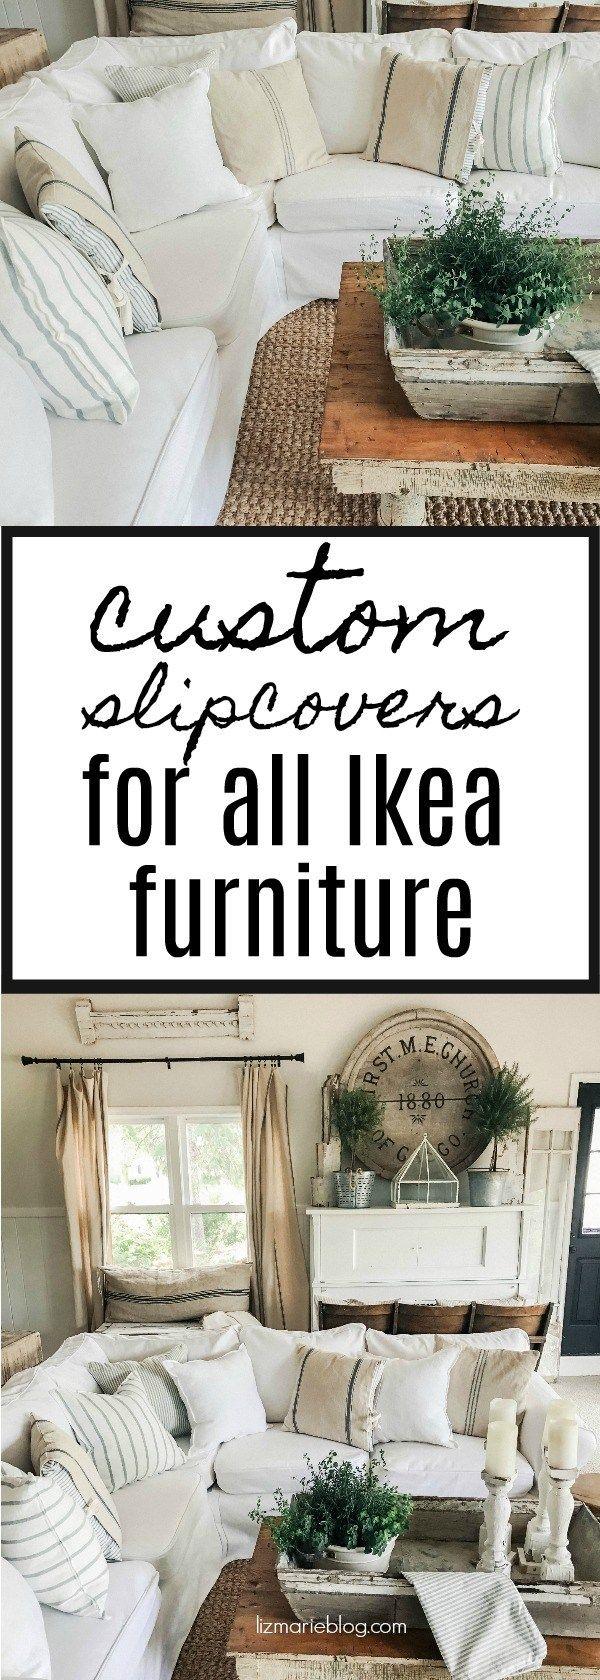 Custom ikea dining chair cover now available via comfort works - Custom Ikea Furniture Slipcovers